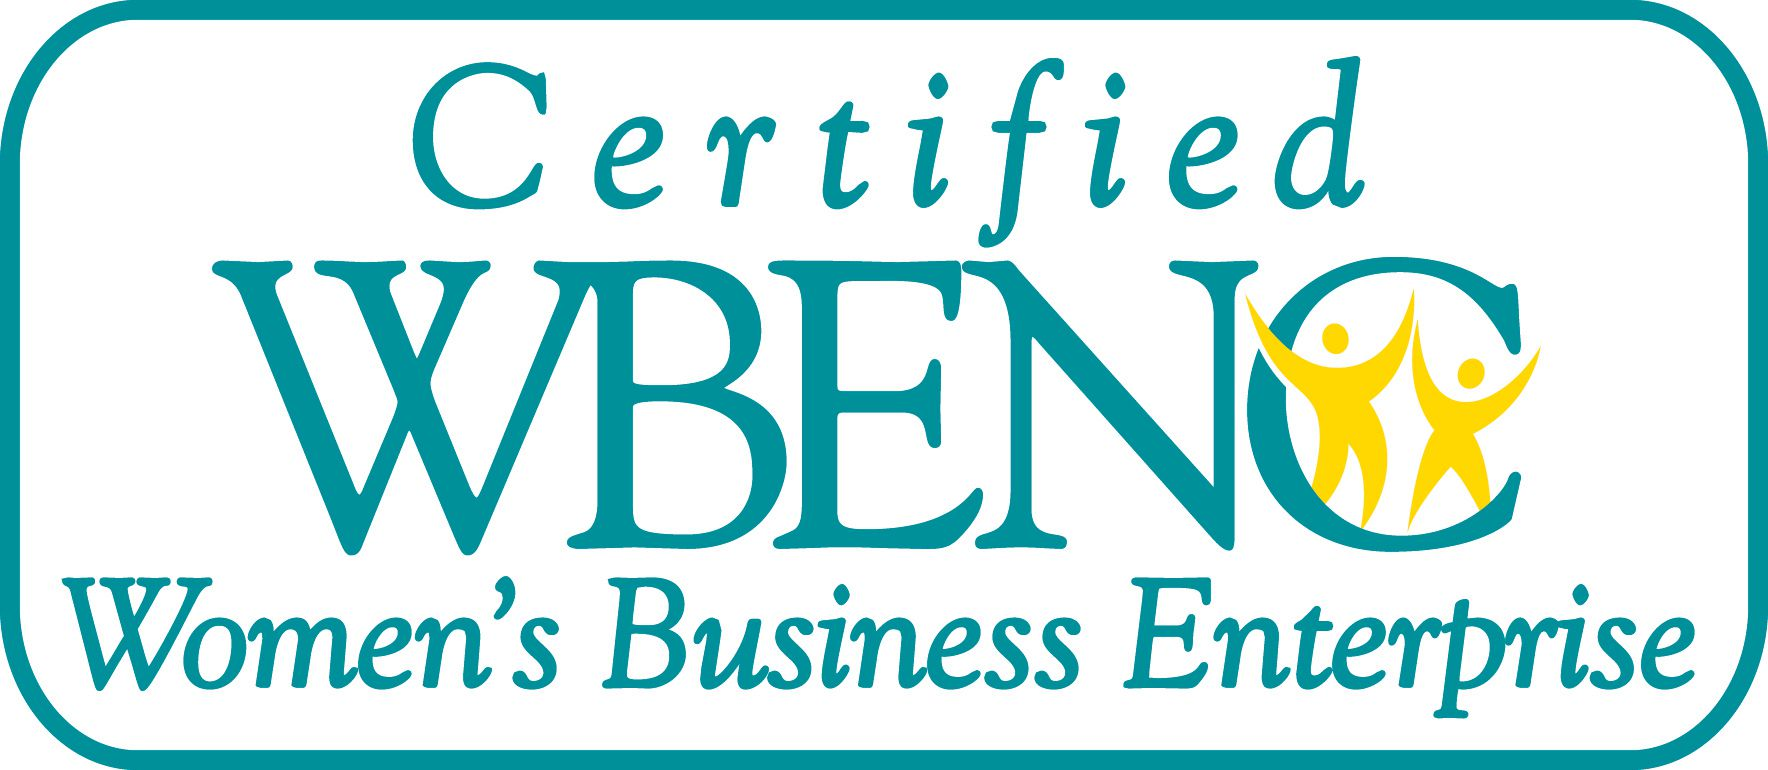 543-the-brand-stewards-WBENC-certified.jpg